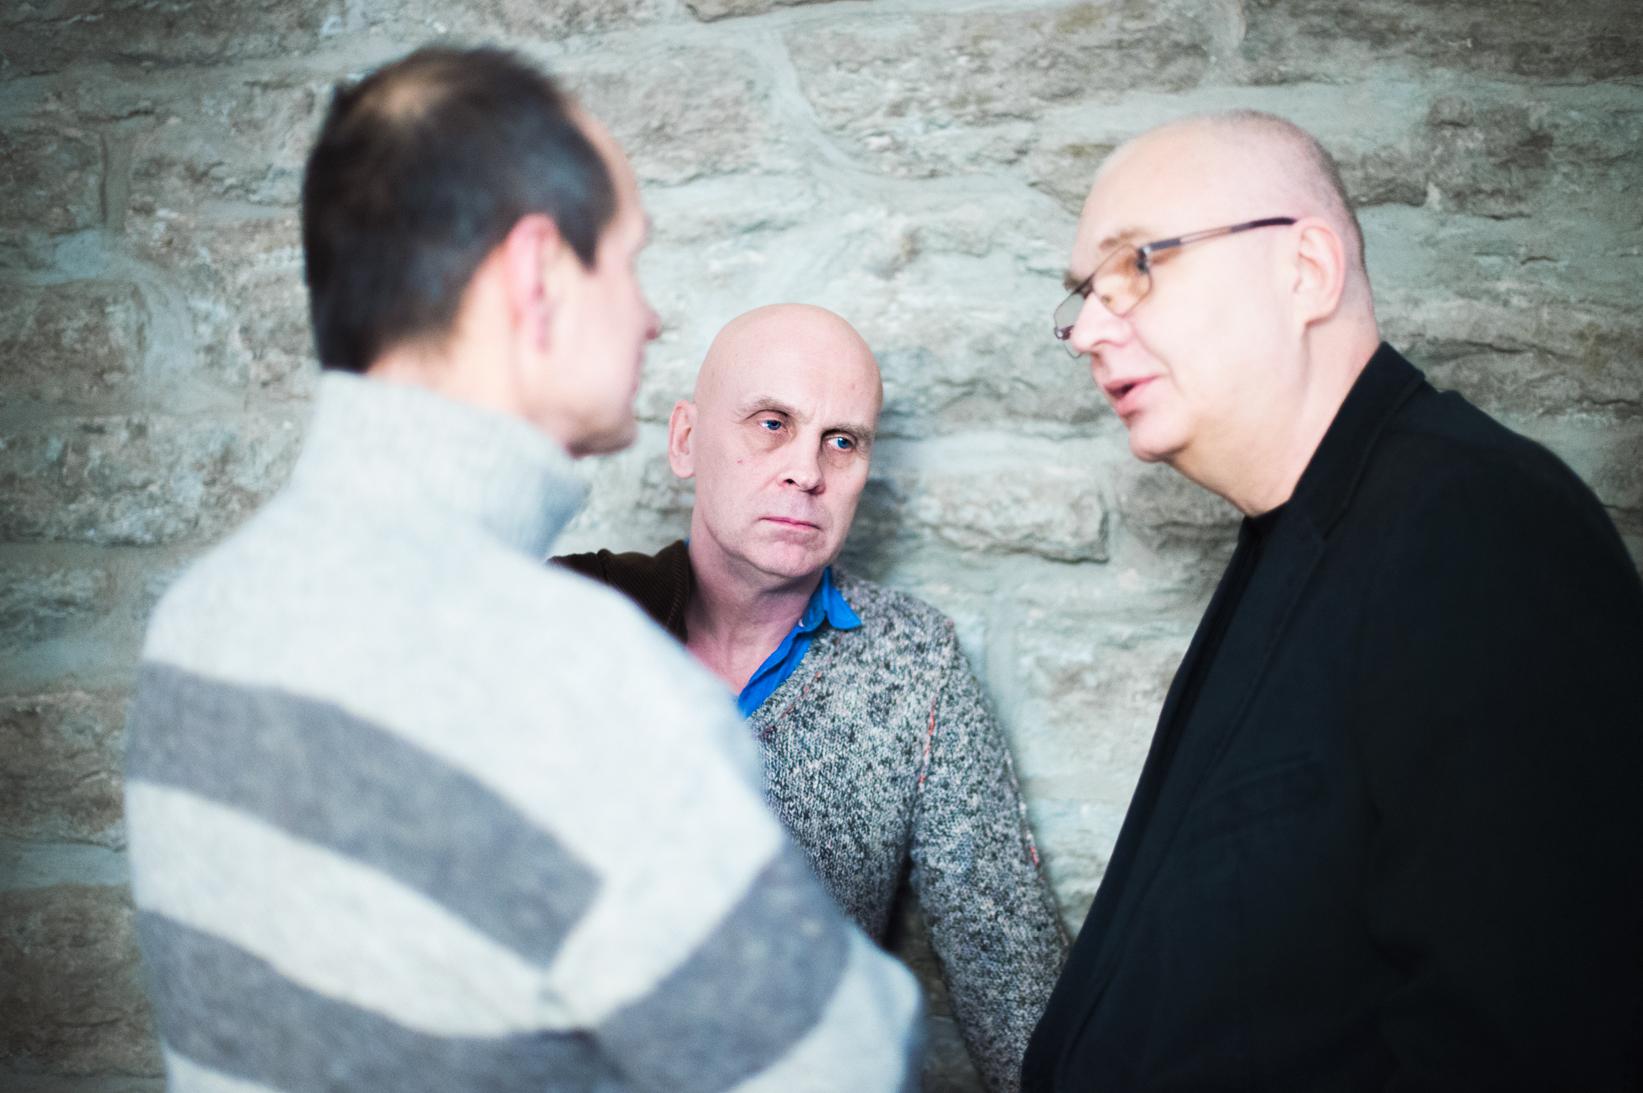 Riho Västrik, Manfred Vainokivi, Hannes Lintrop